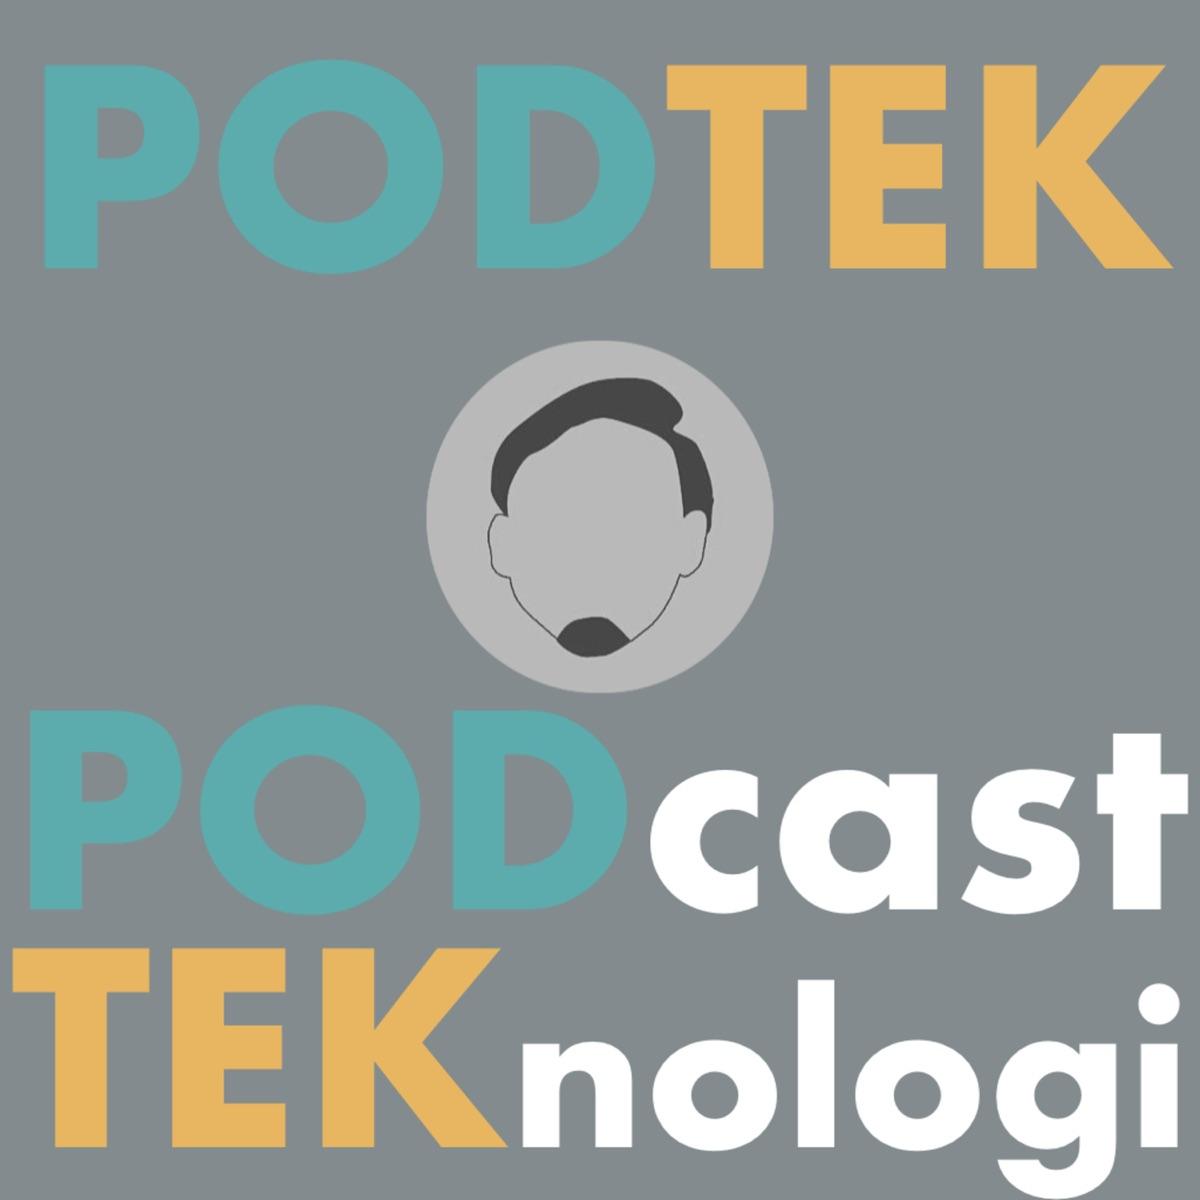 PODTEK! Podcast Teknologi